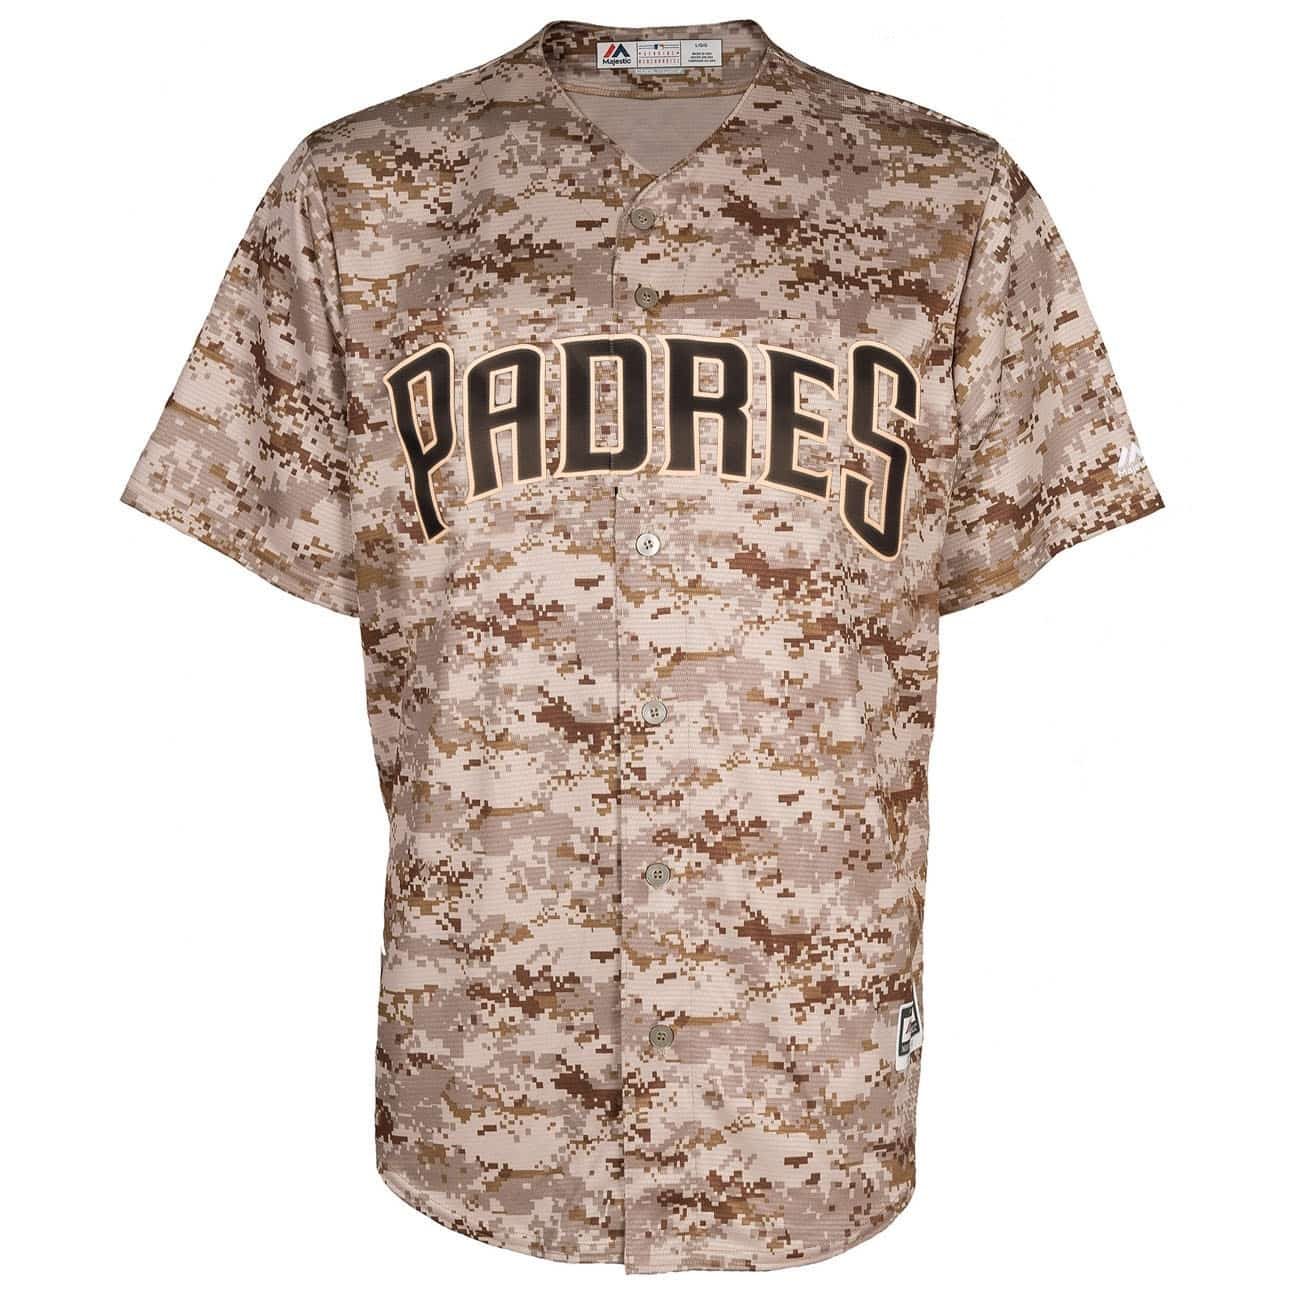 cheaper 4c1b2 b9478 Majestic San Diego Padres Cool Base MLB Jersey US Marines   TAASS.com Fan  Shop